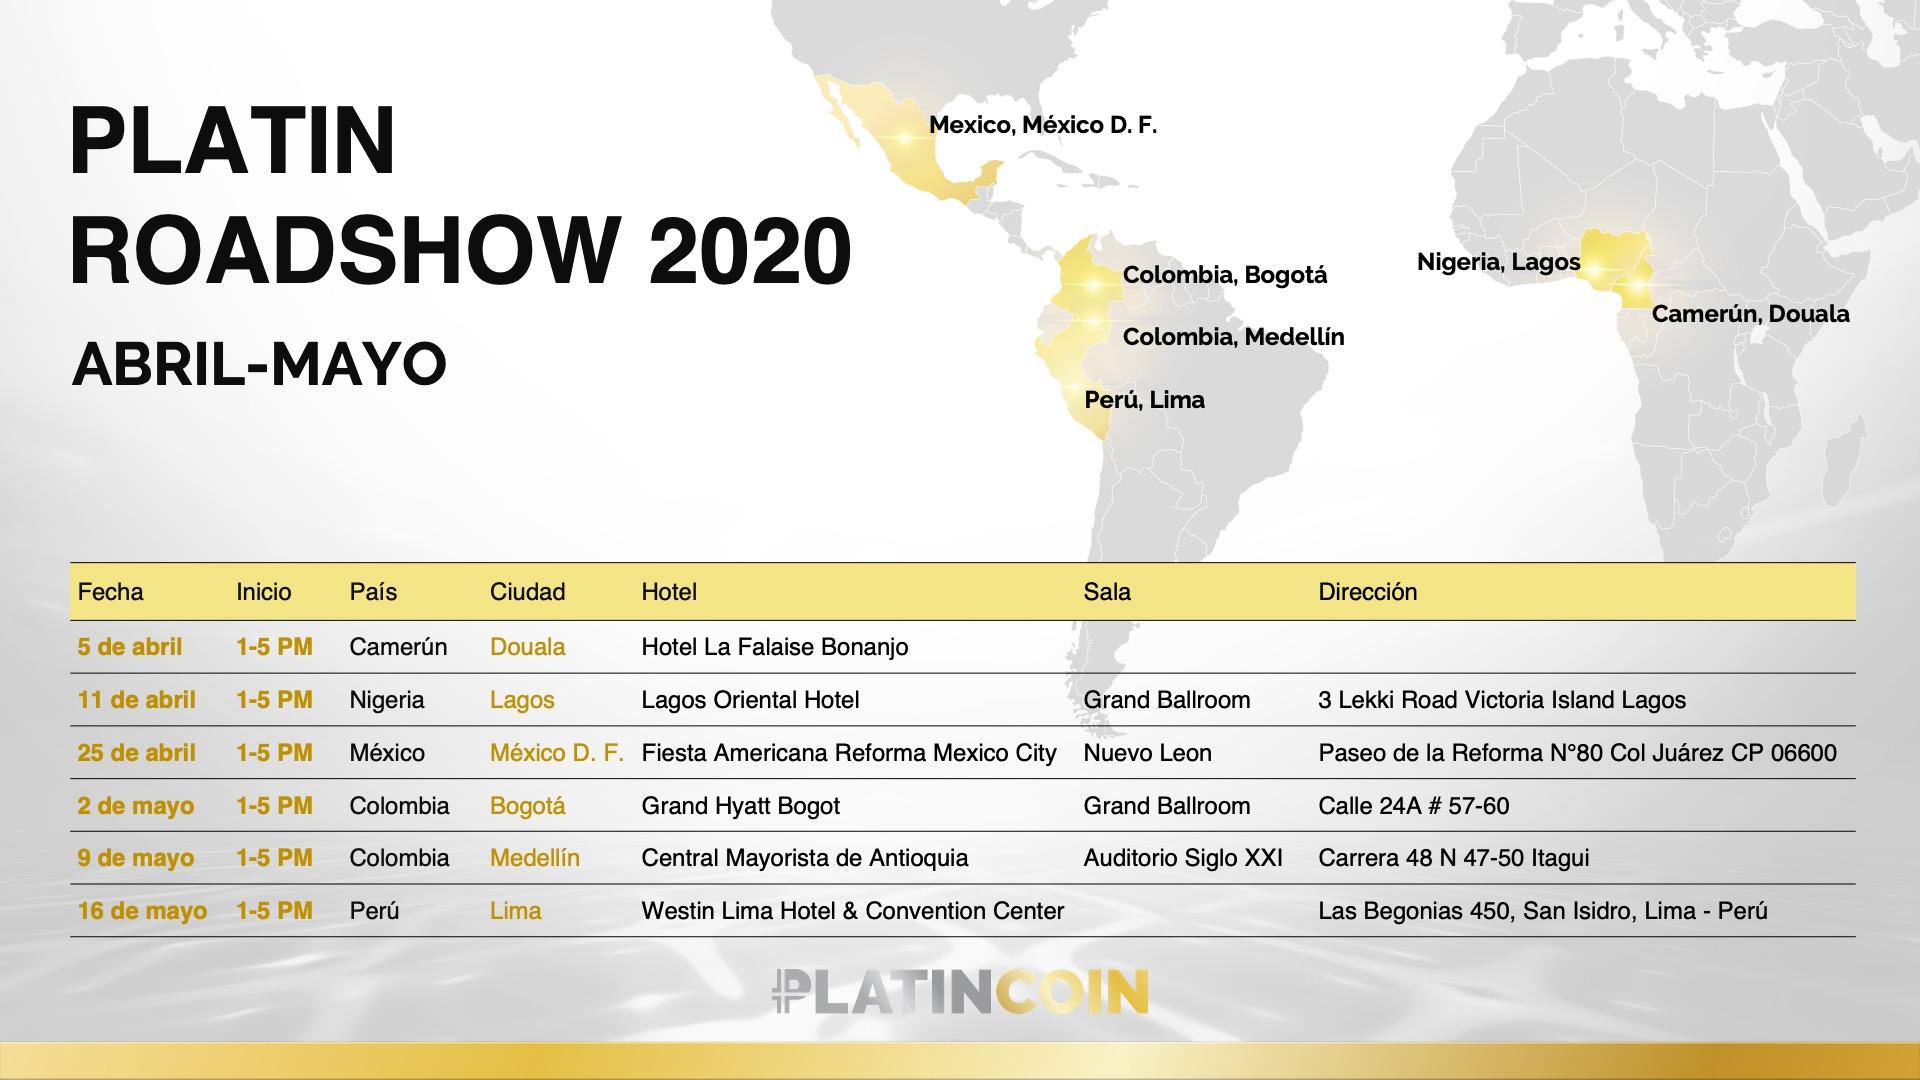 PLATINCOIN en América Latina y África: continúa la expansión mundial